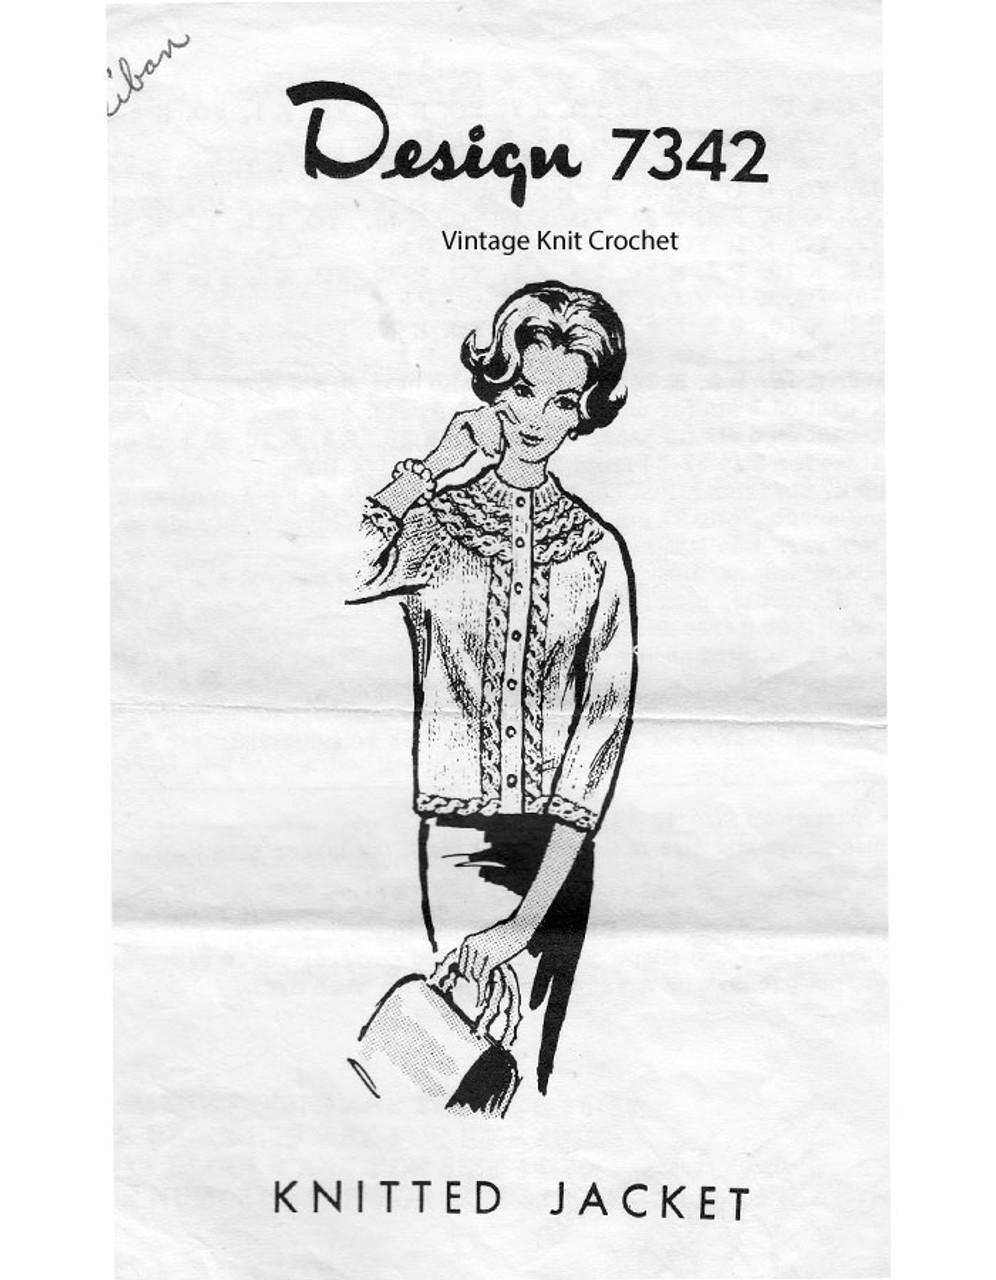 Plus size Jacket Knitting Pattern, Mail Order Design 7342